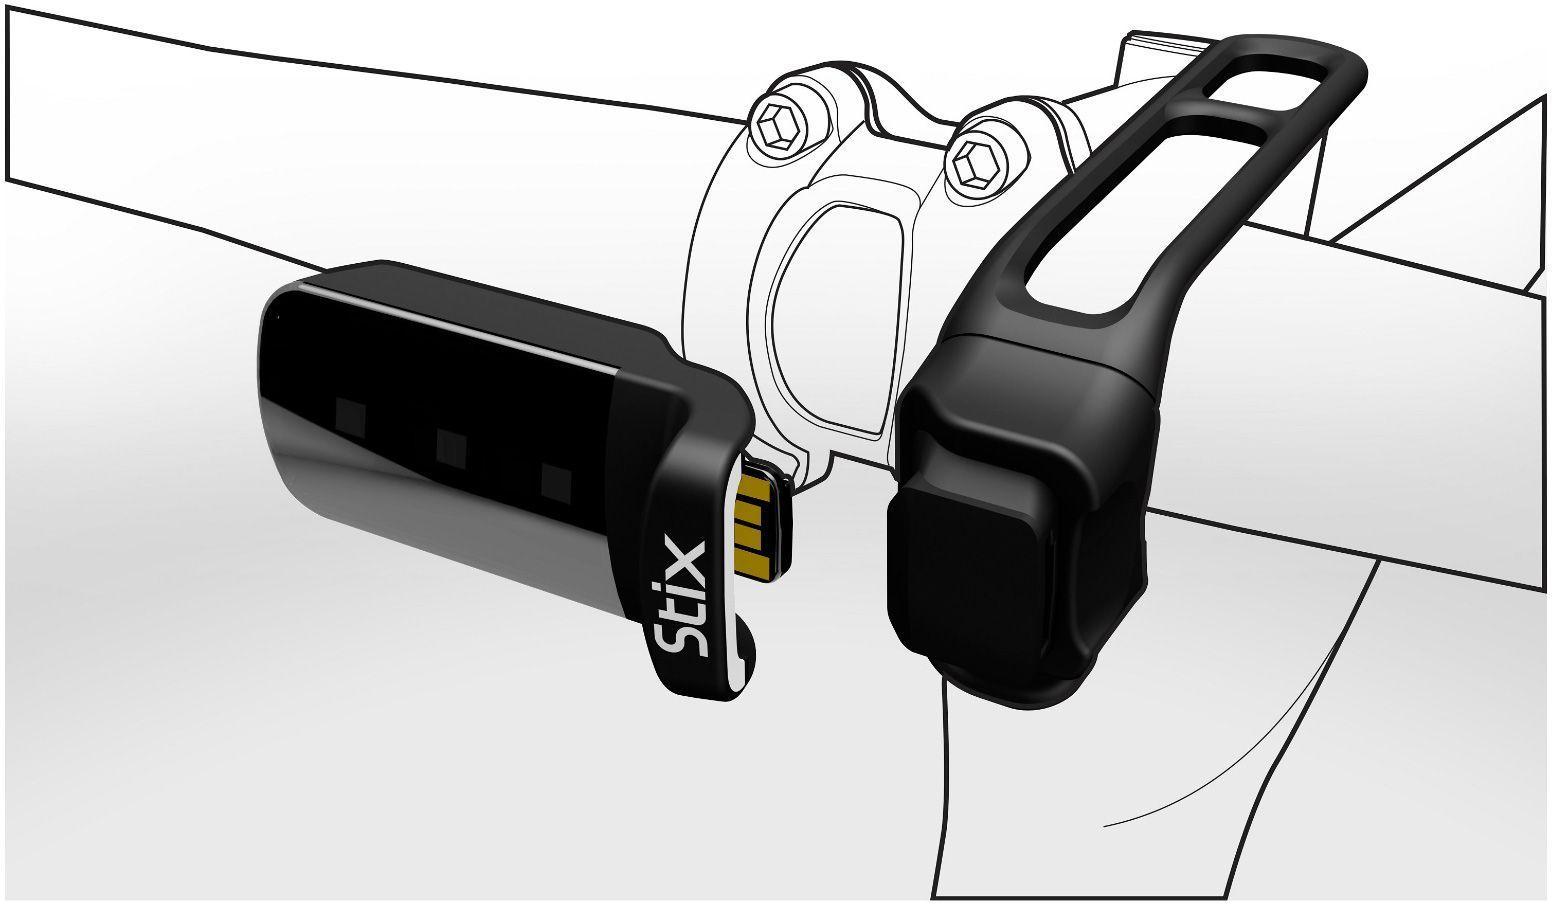 Specialized Stix Handlebar/Seatpost Mount - black uni